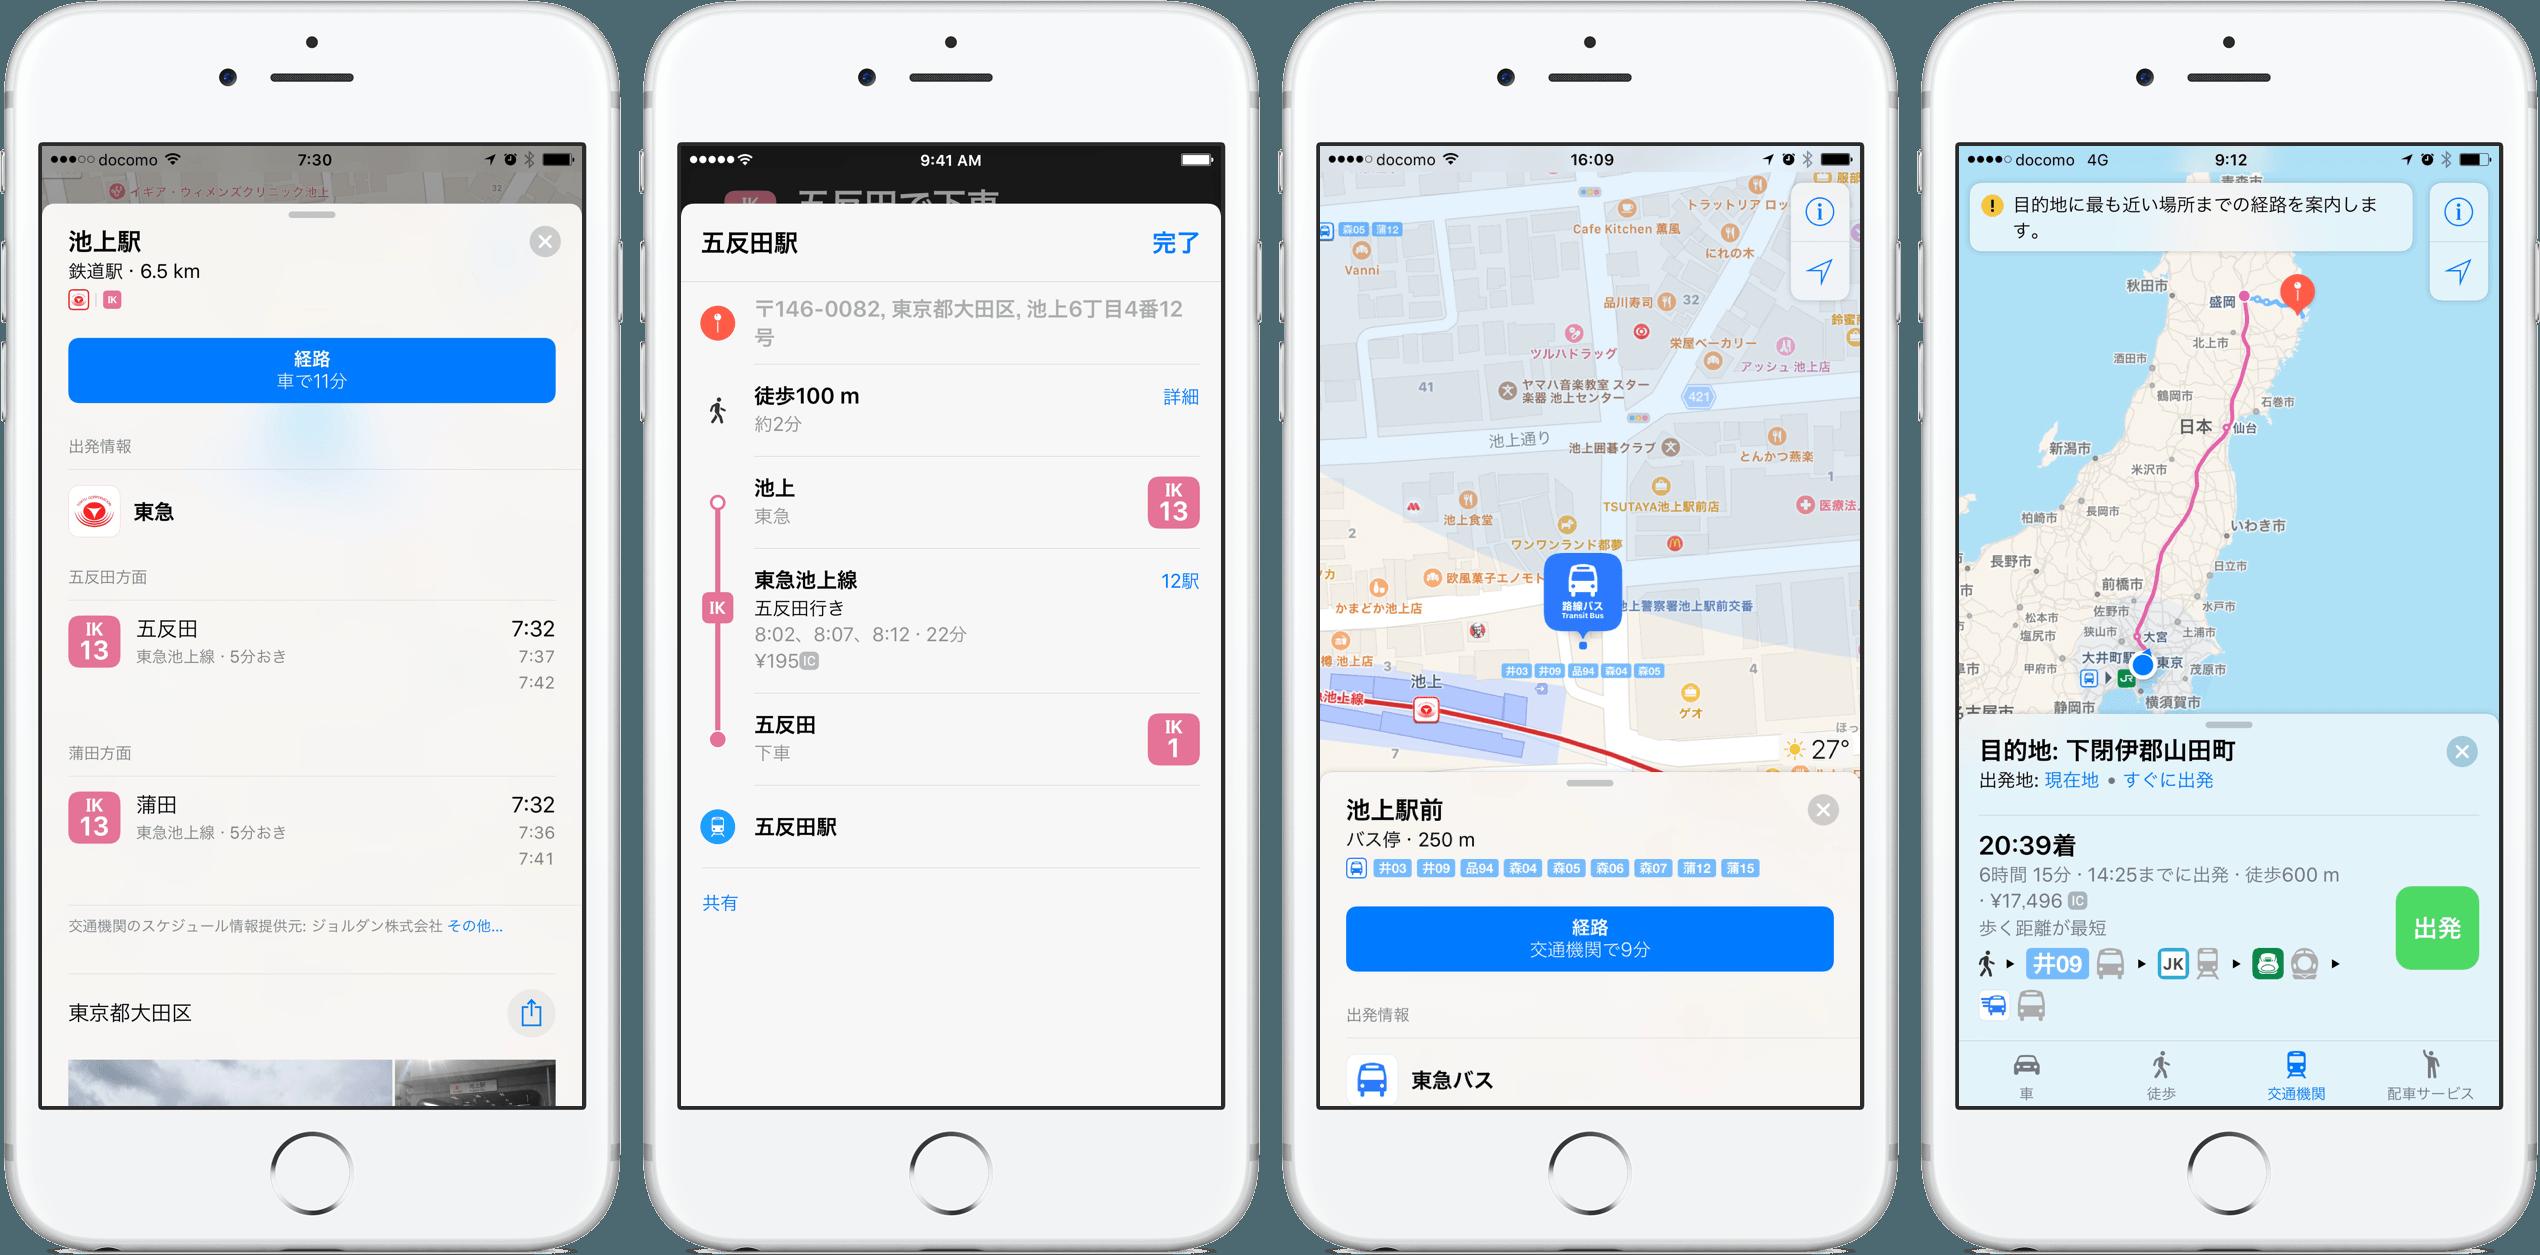 Apple อัพเดตแผนที่ Apple Maps ในประเทศญี่ปุ่น เพิ่มข้อมูล ...